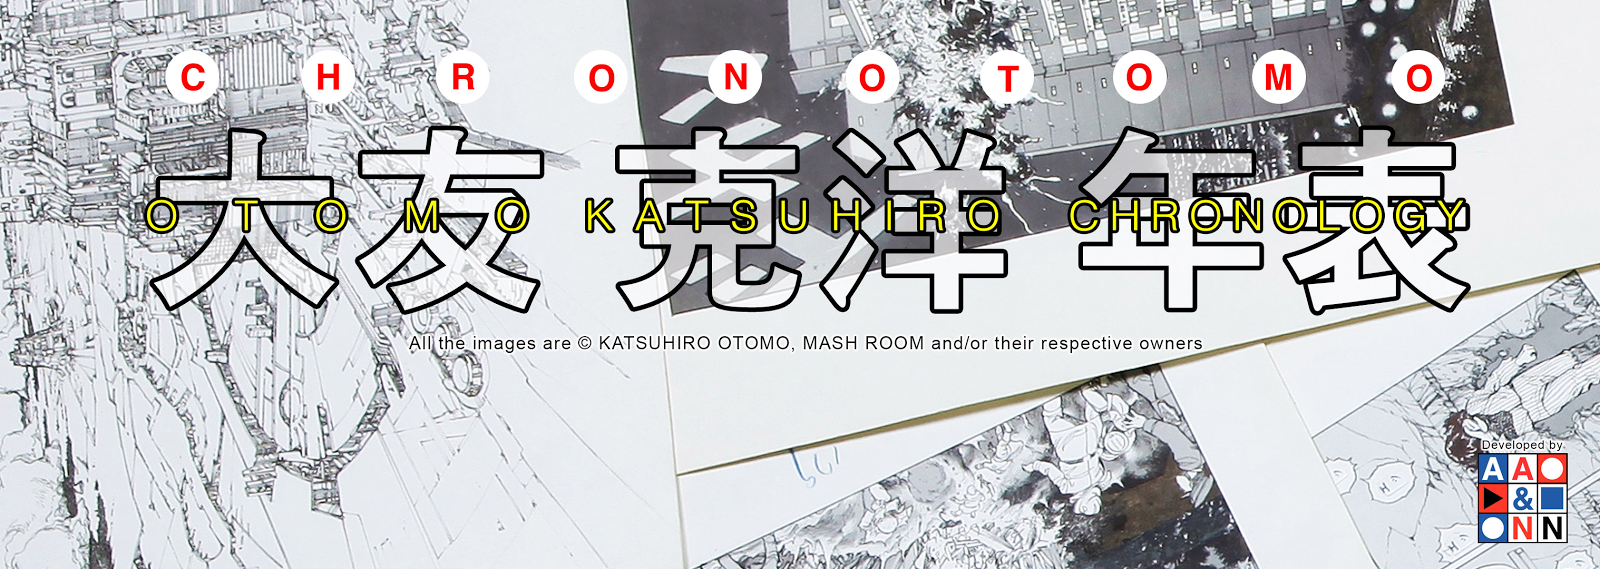 ChronOtomo: Otomo Katsuhiro Chronology